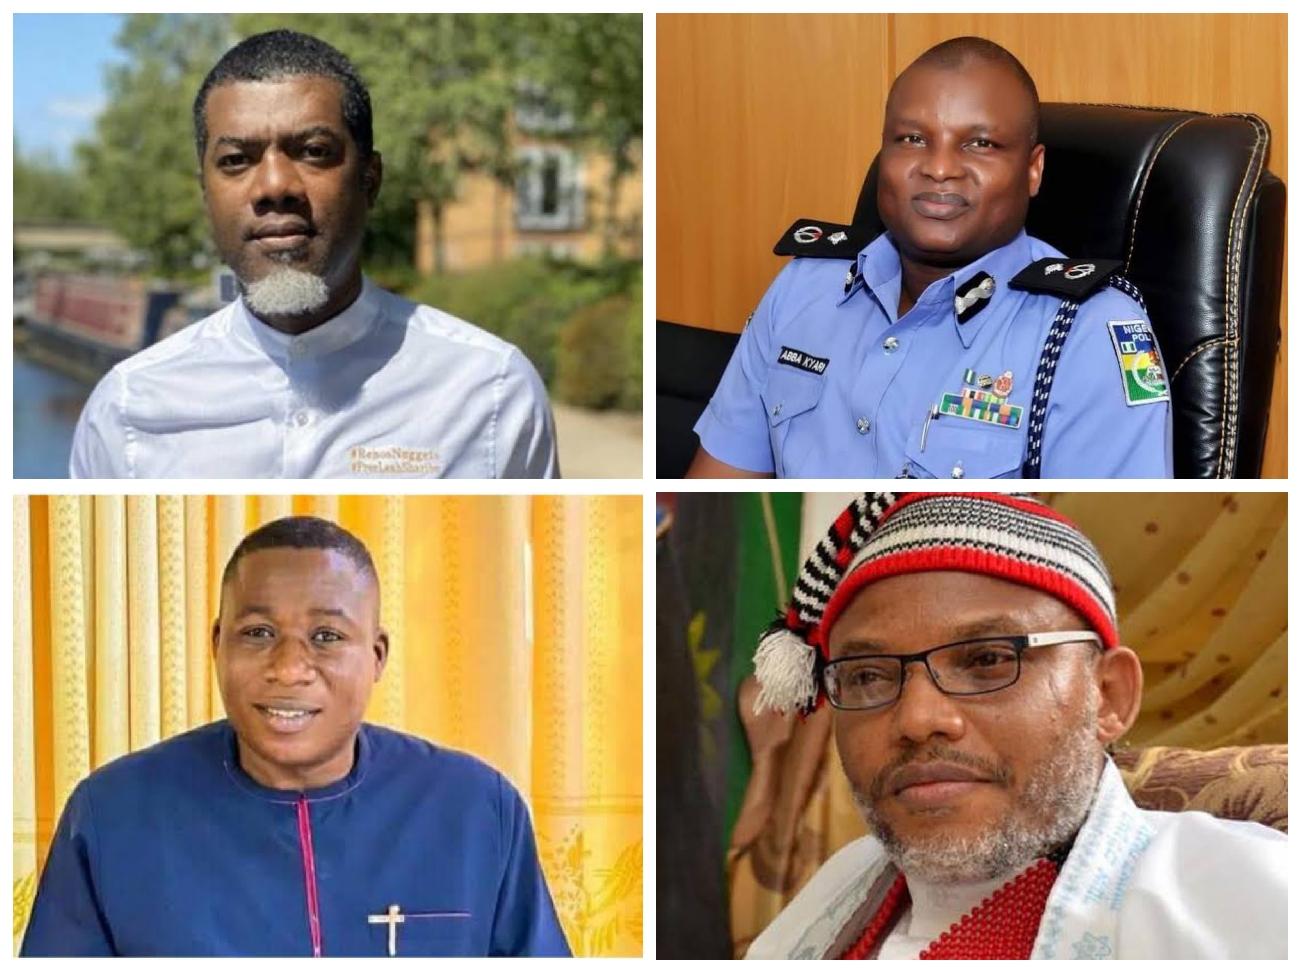 Reno Omokri Slams Those Who Rejoiced When Nnamdi Kauu And Sunday Igboho Were Arrested, But Demands Due Process In Abba Kyari's Case